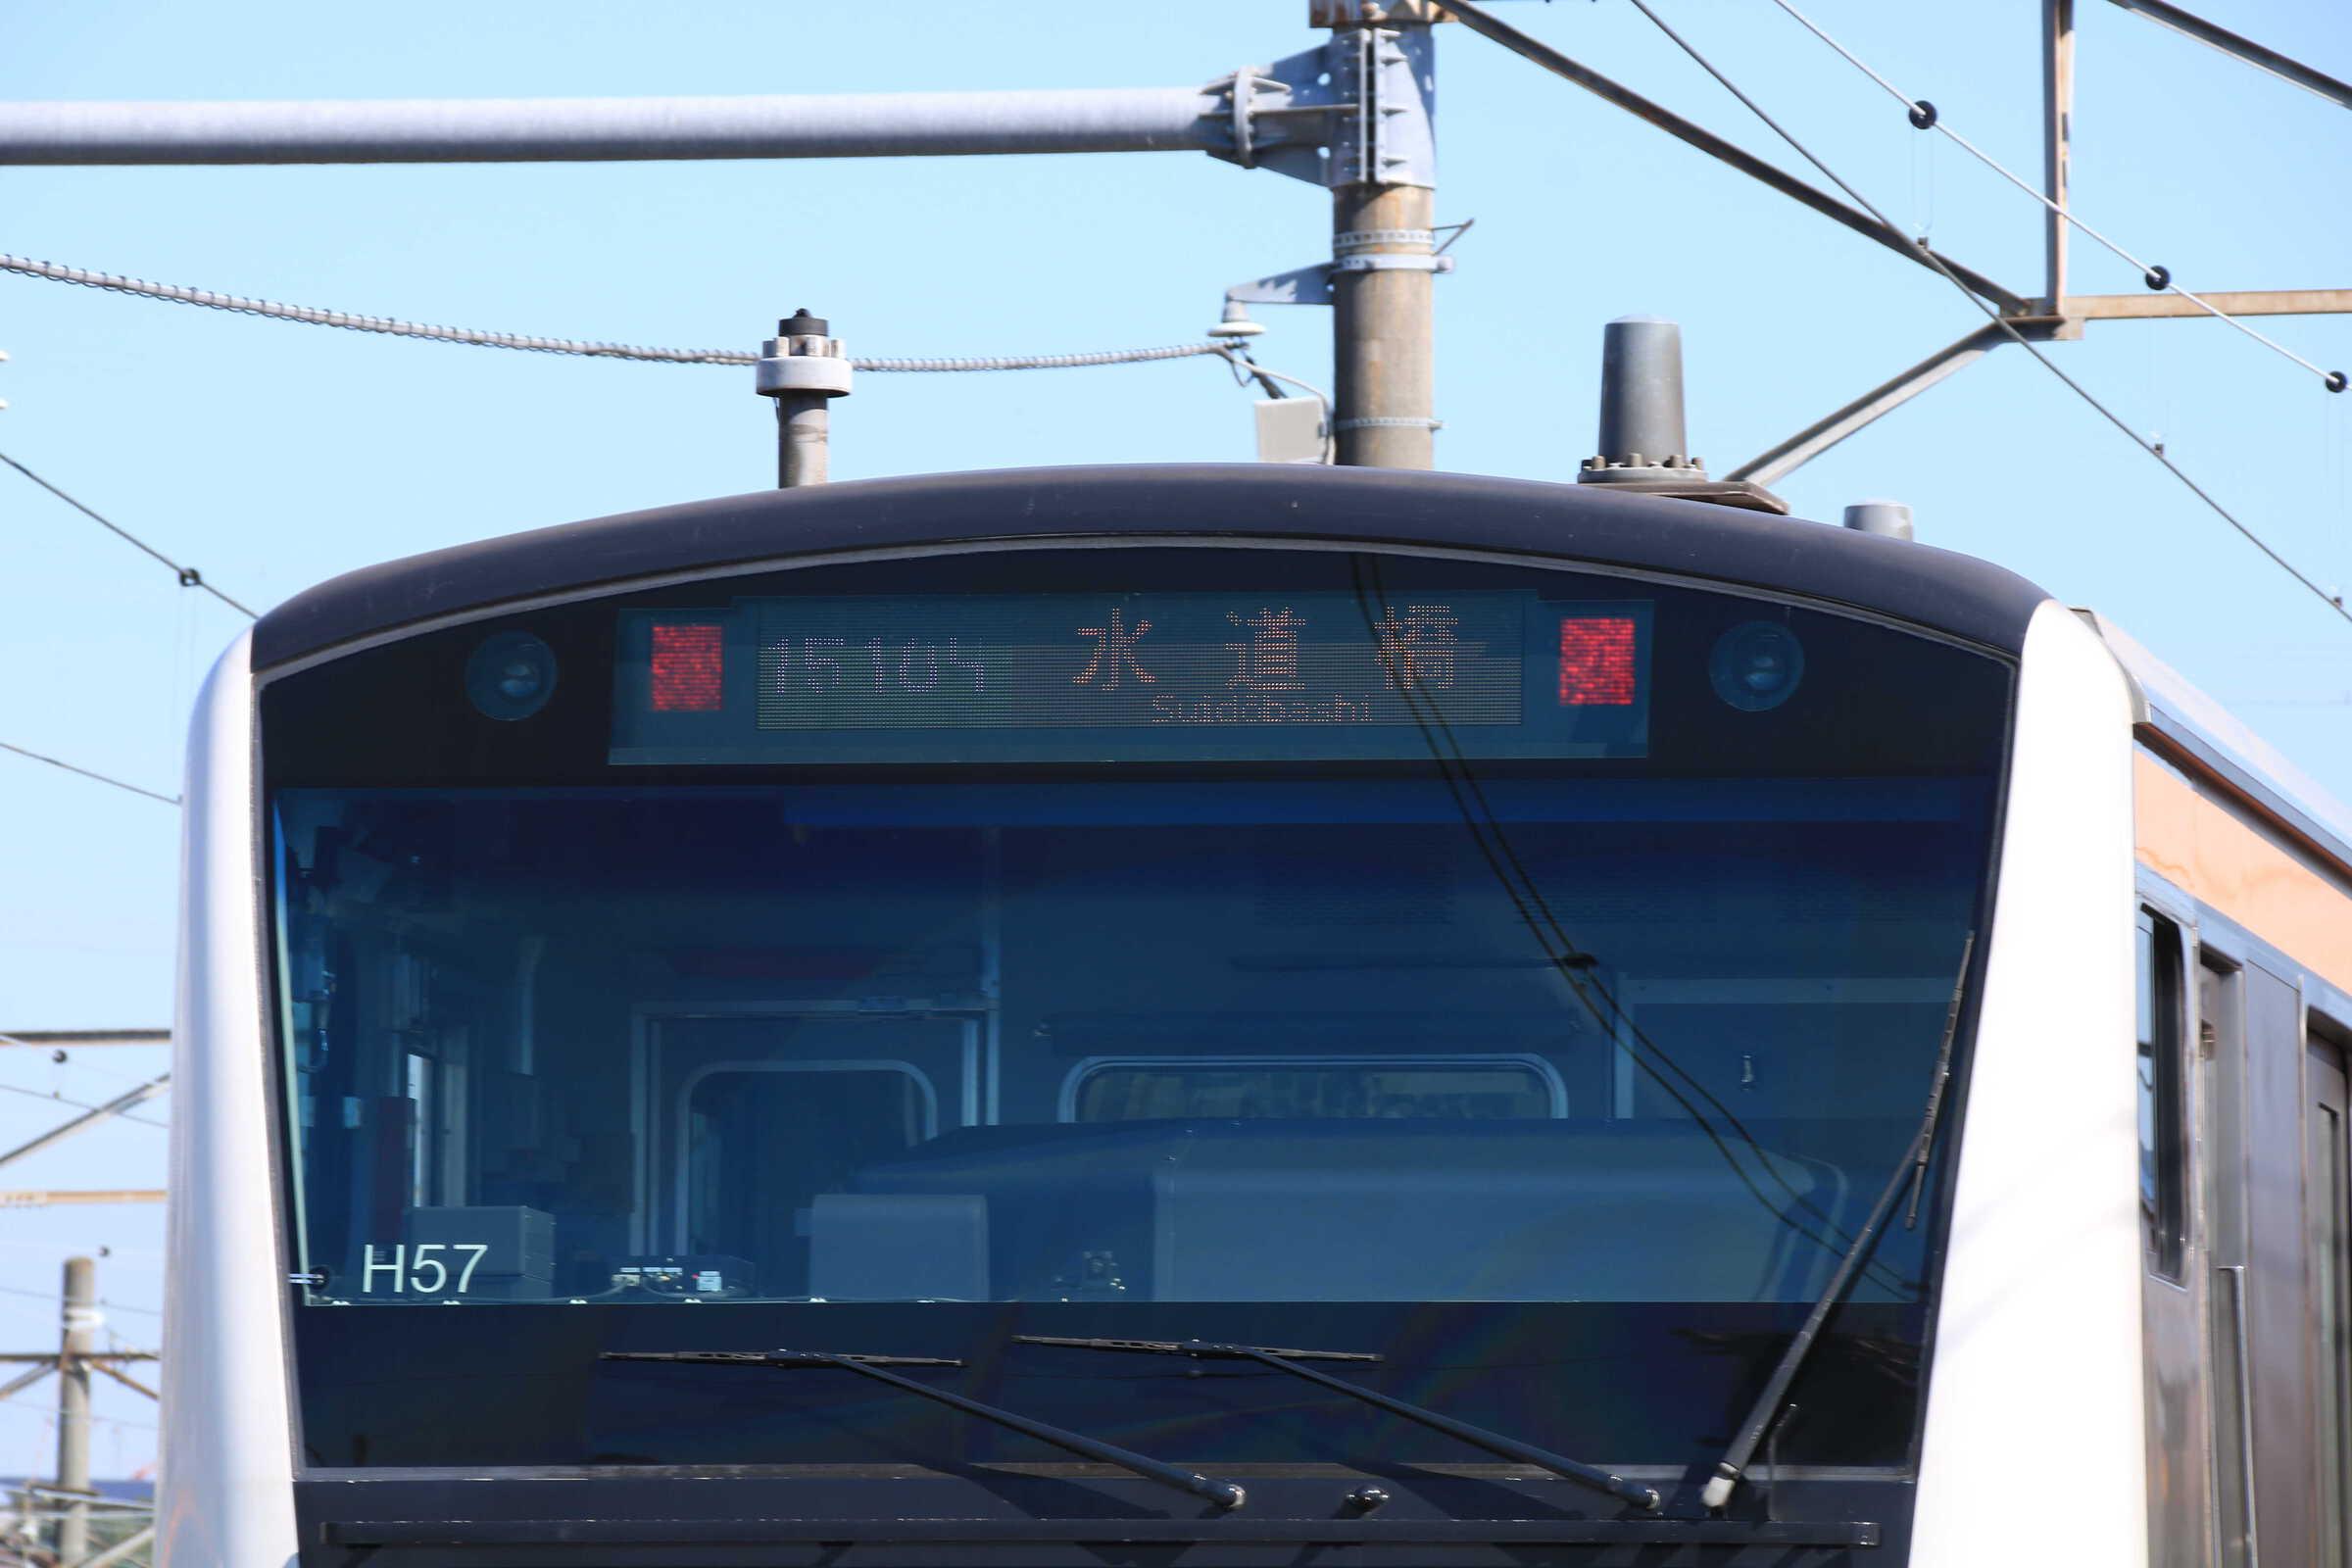 1510H 水道橋行き E233系 八トタH57編成